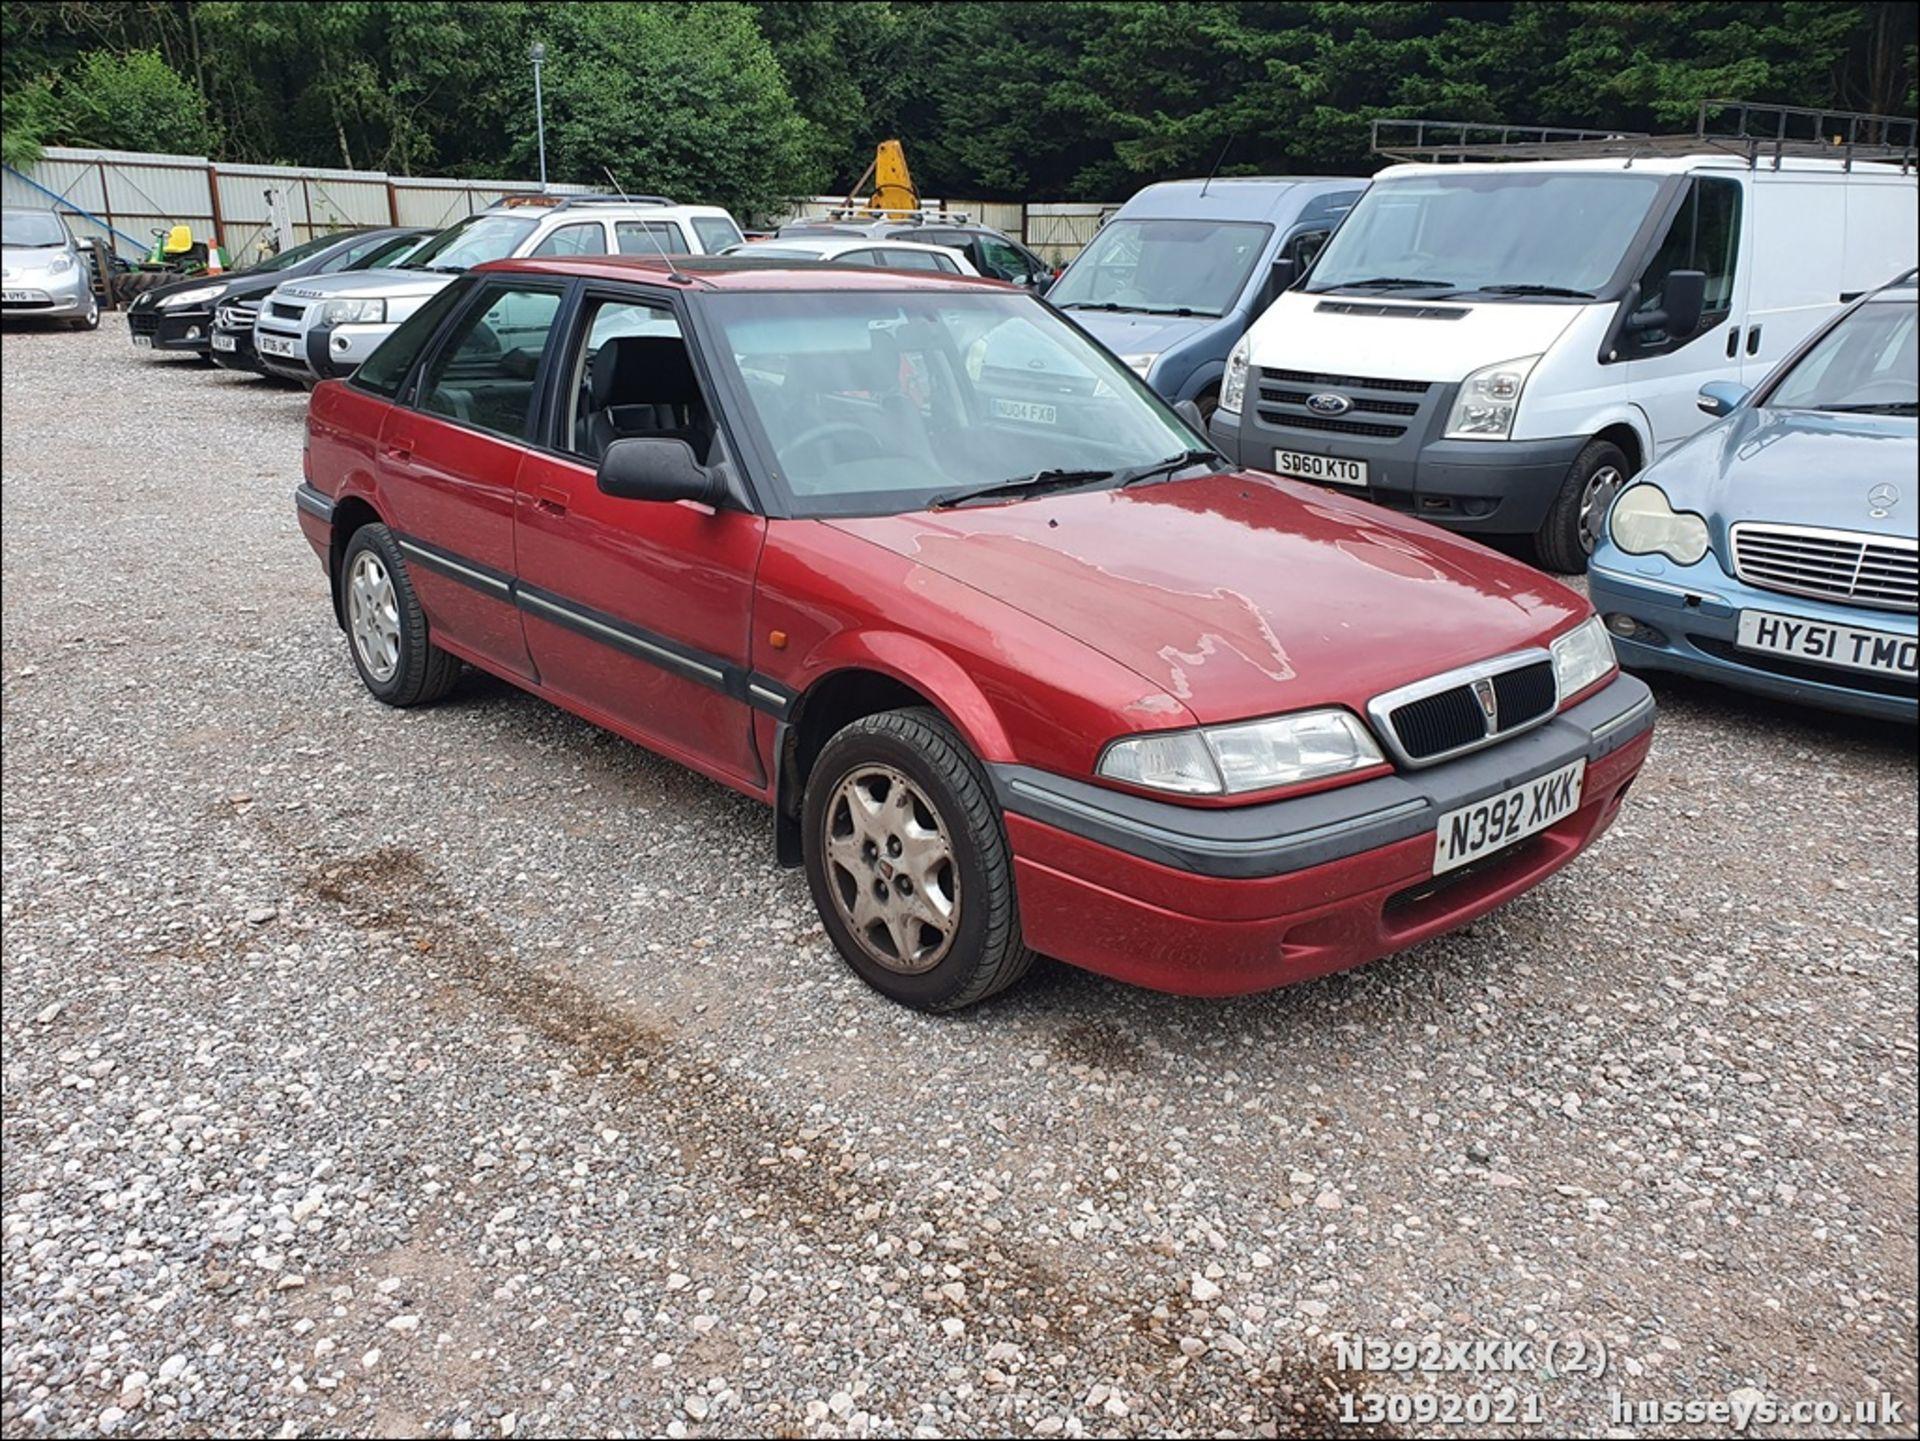 1995 ROVER 214 SEI - 1396cc 5dr Hatchback (Red, 99k) - Image 2 of 15